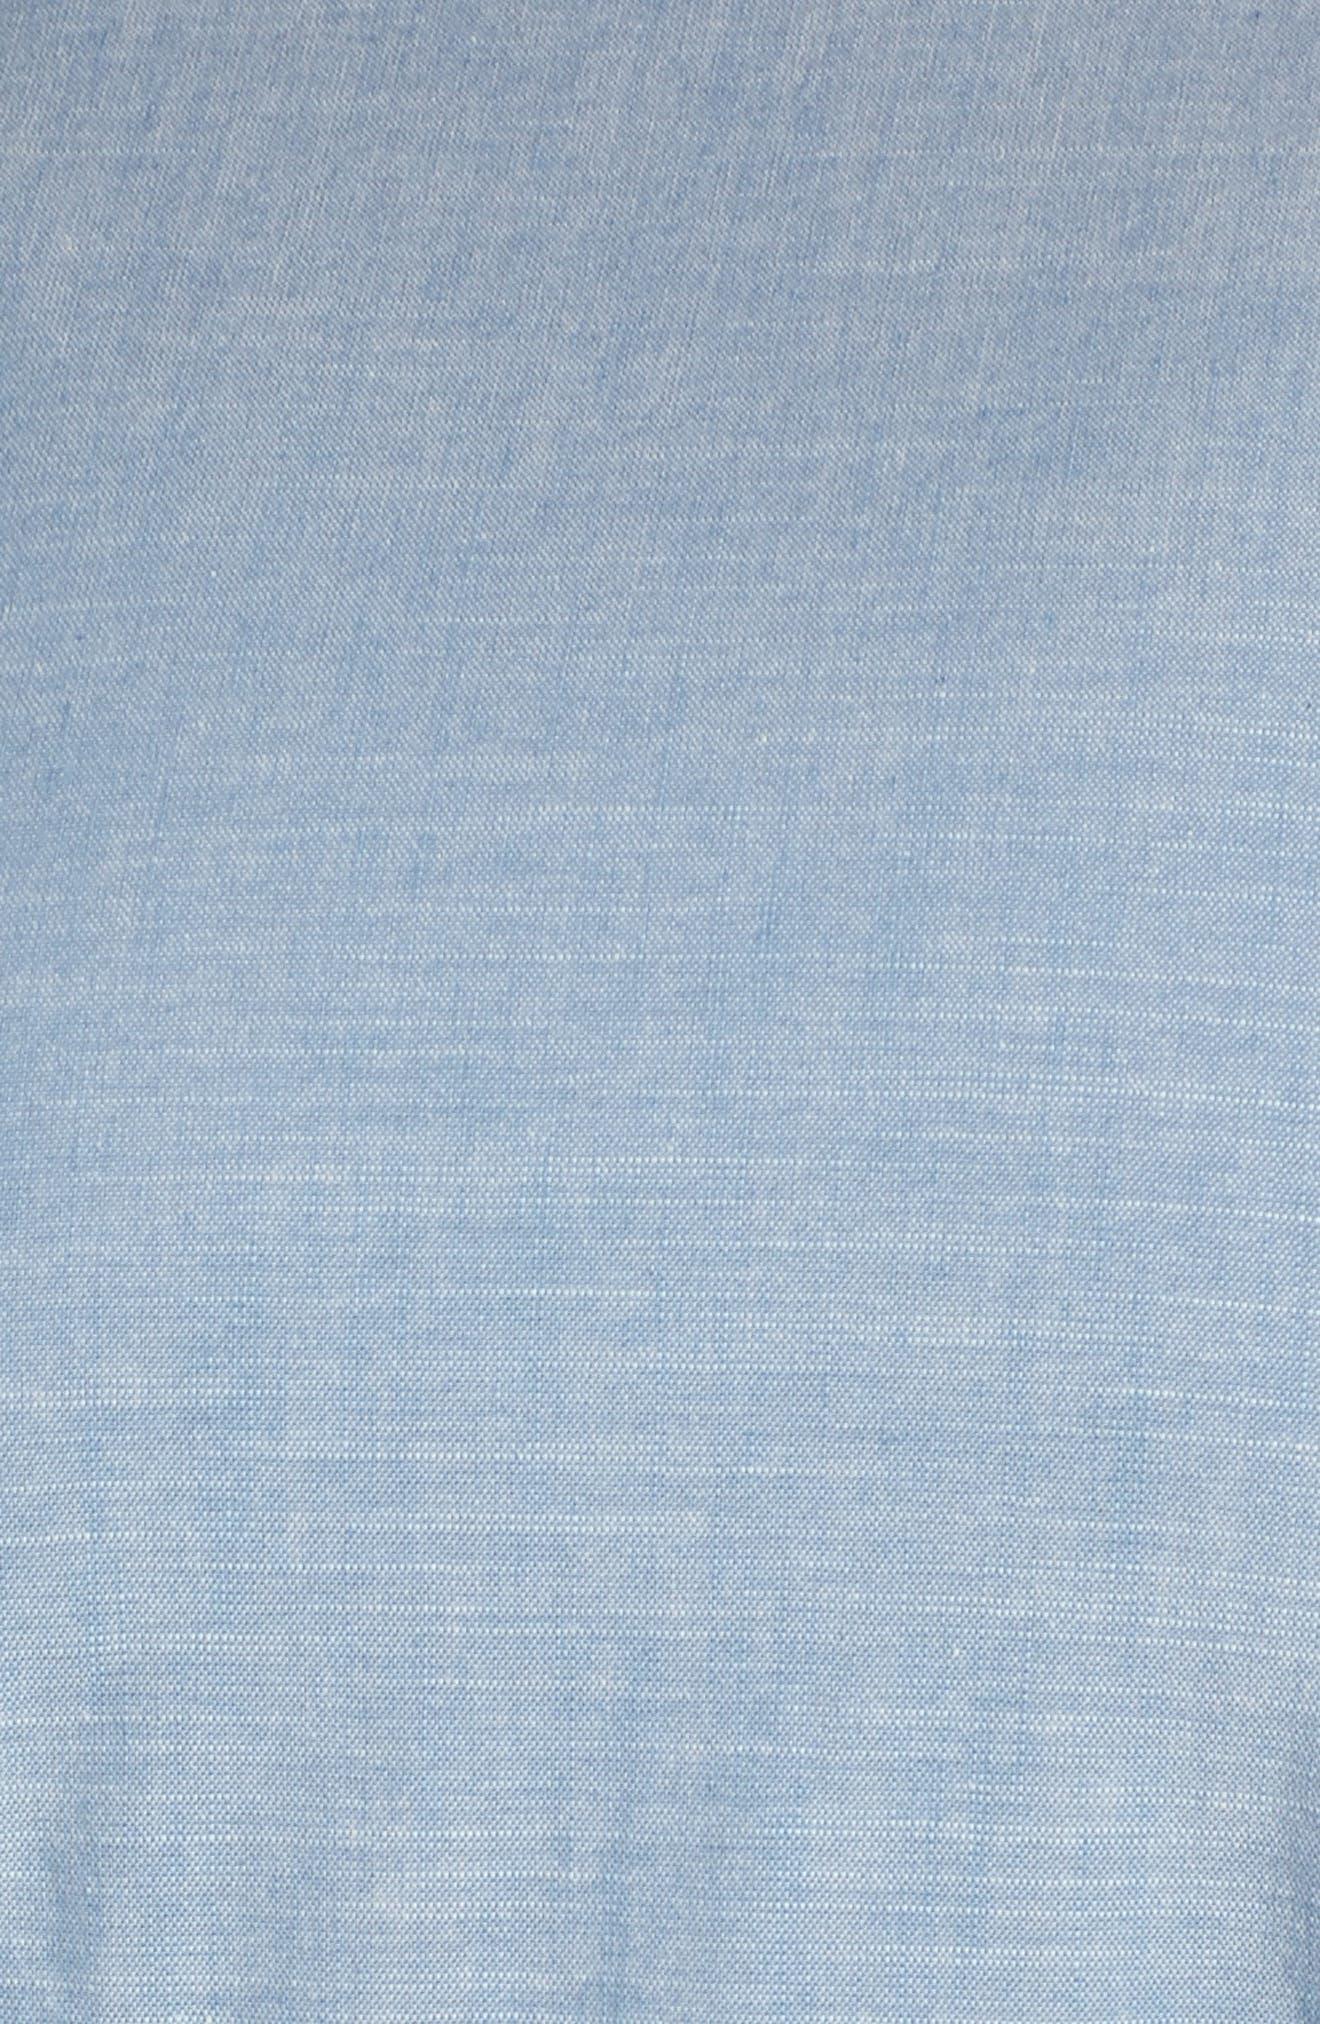 Ruffle Sleeve Jumpsuit,                             Alternate thumbnail 6, color,